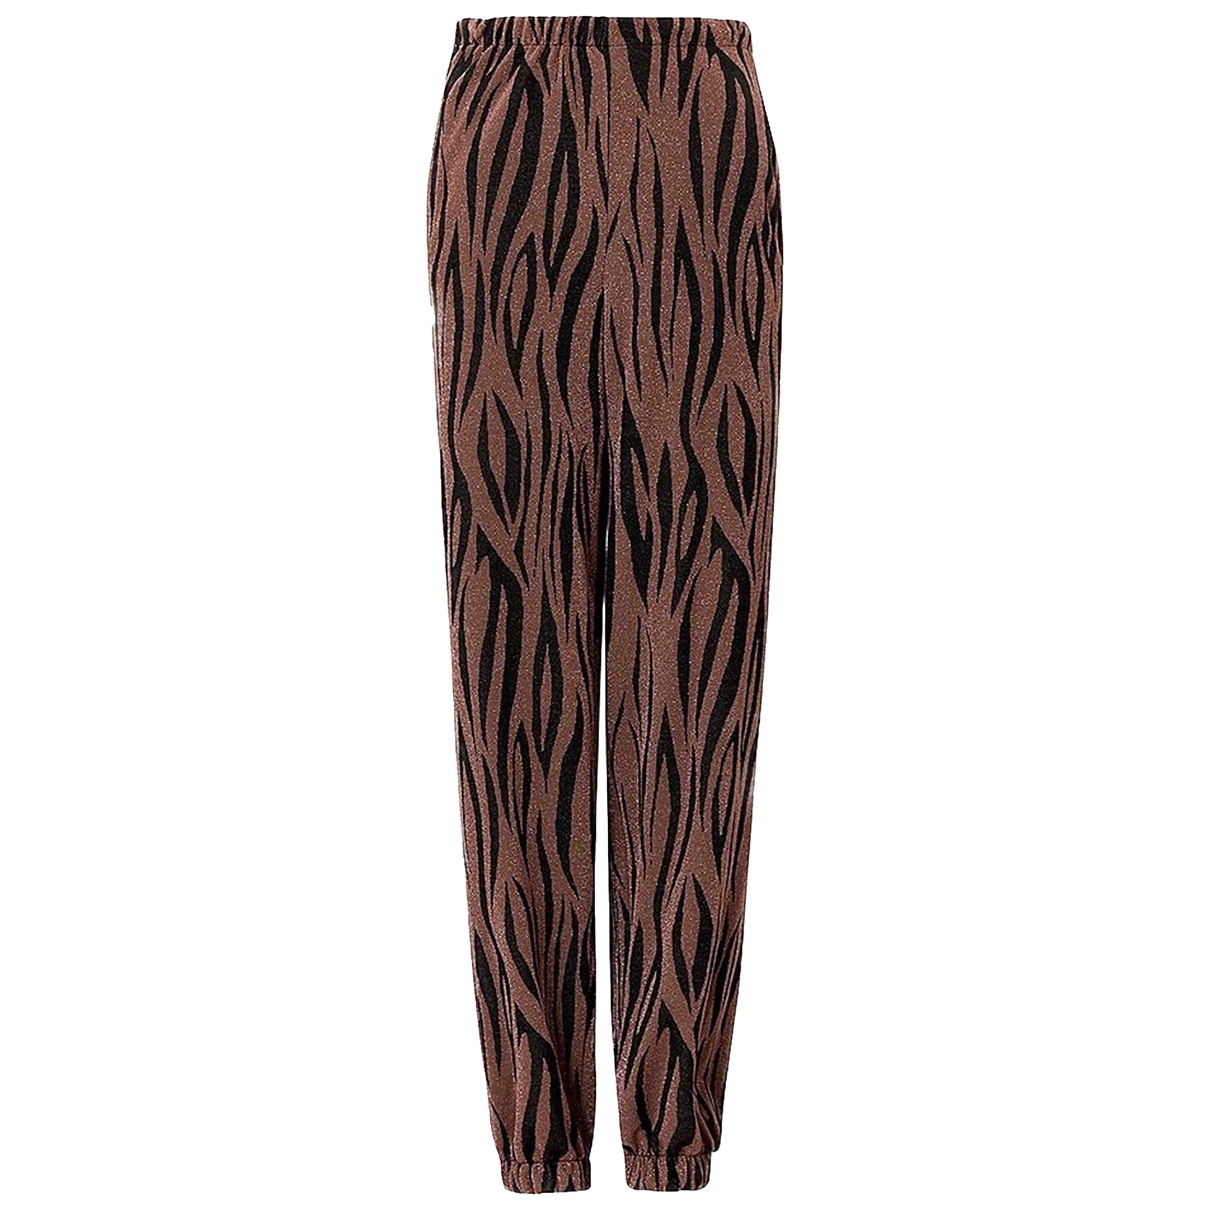 Karen Millen \N Multicolour Trousers for Women XS International